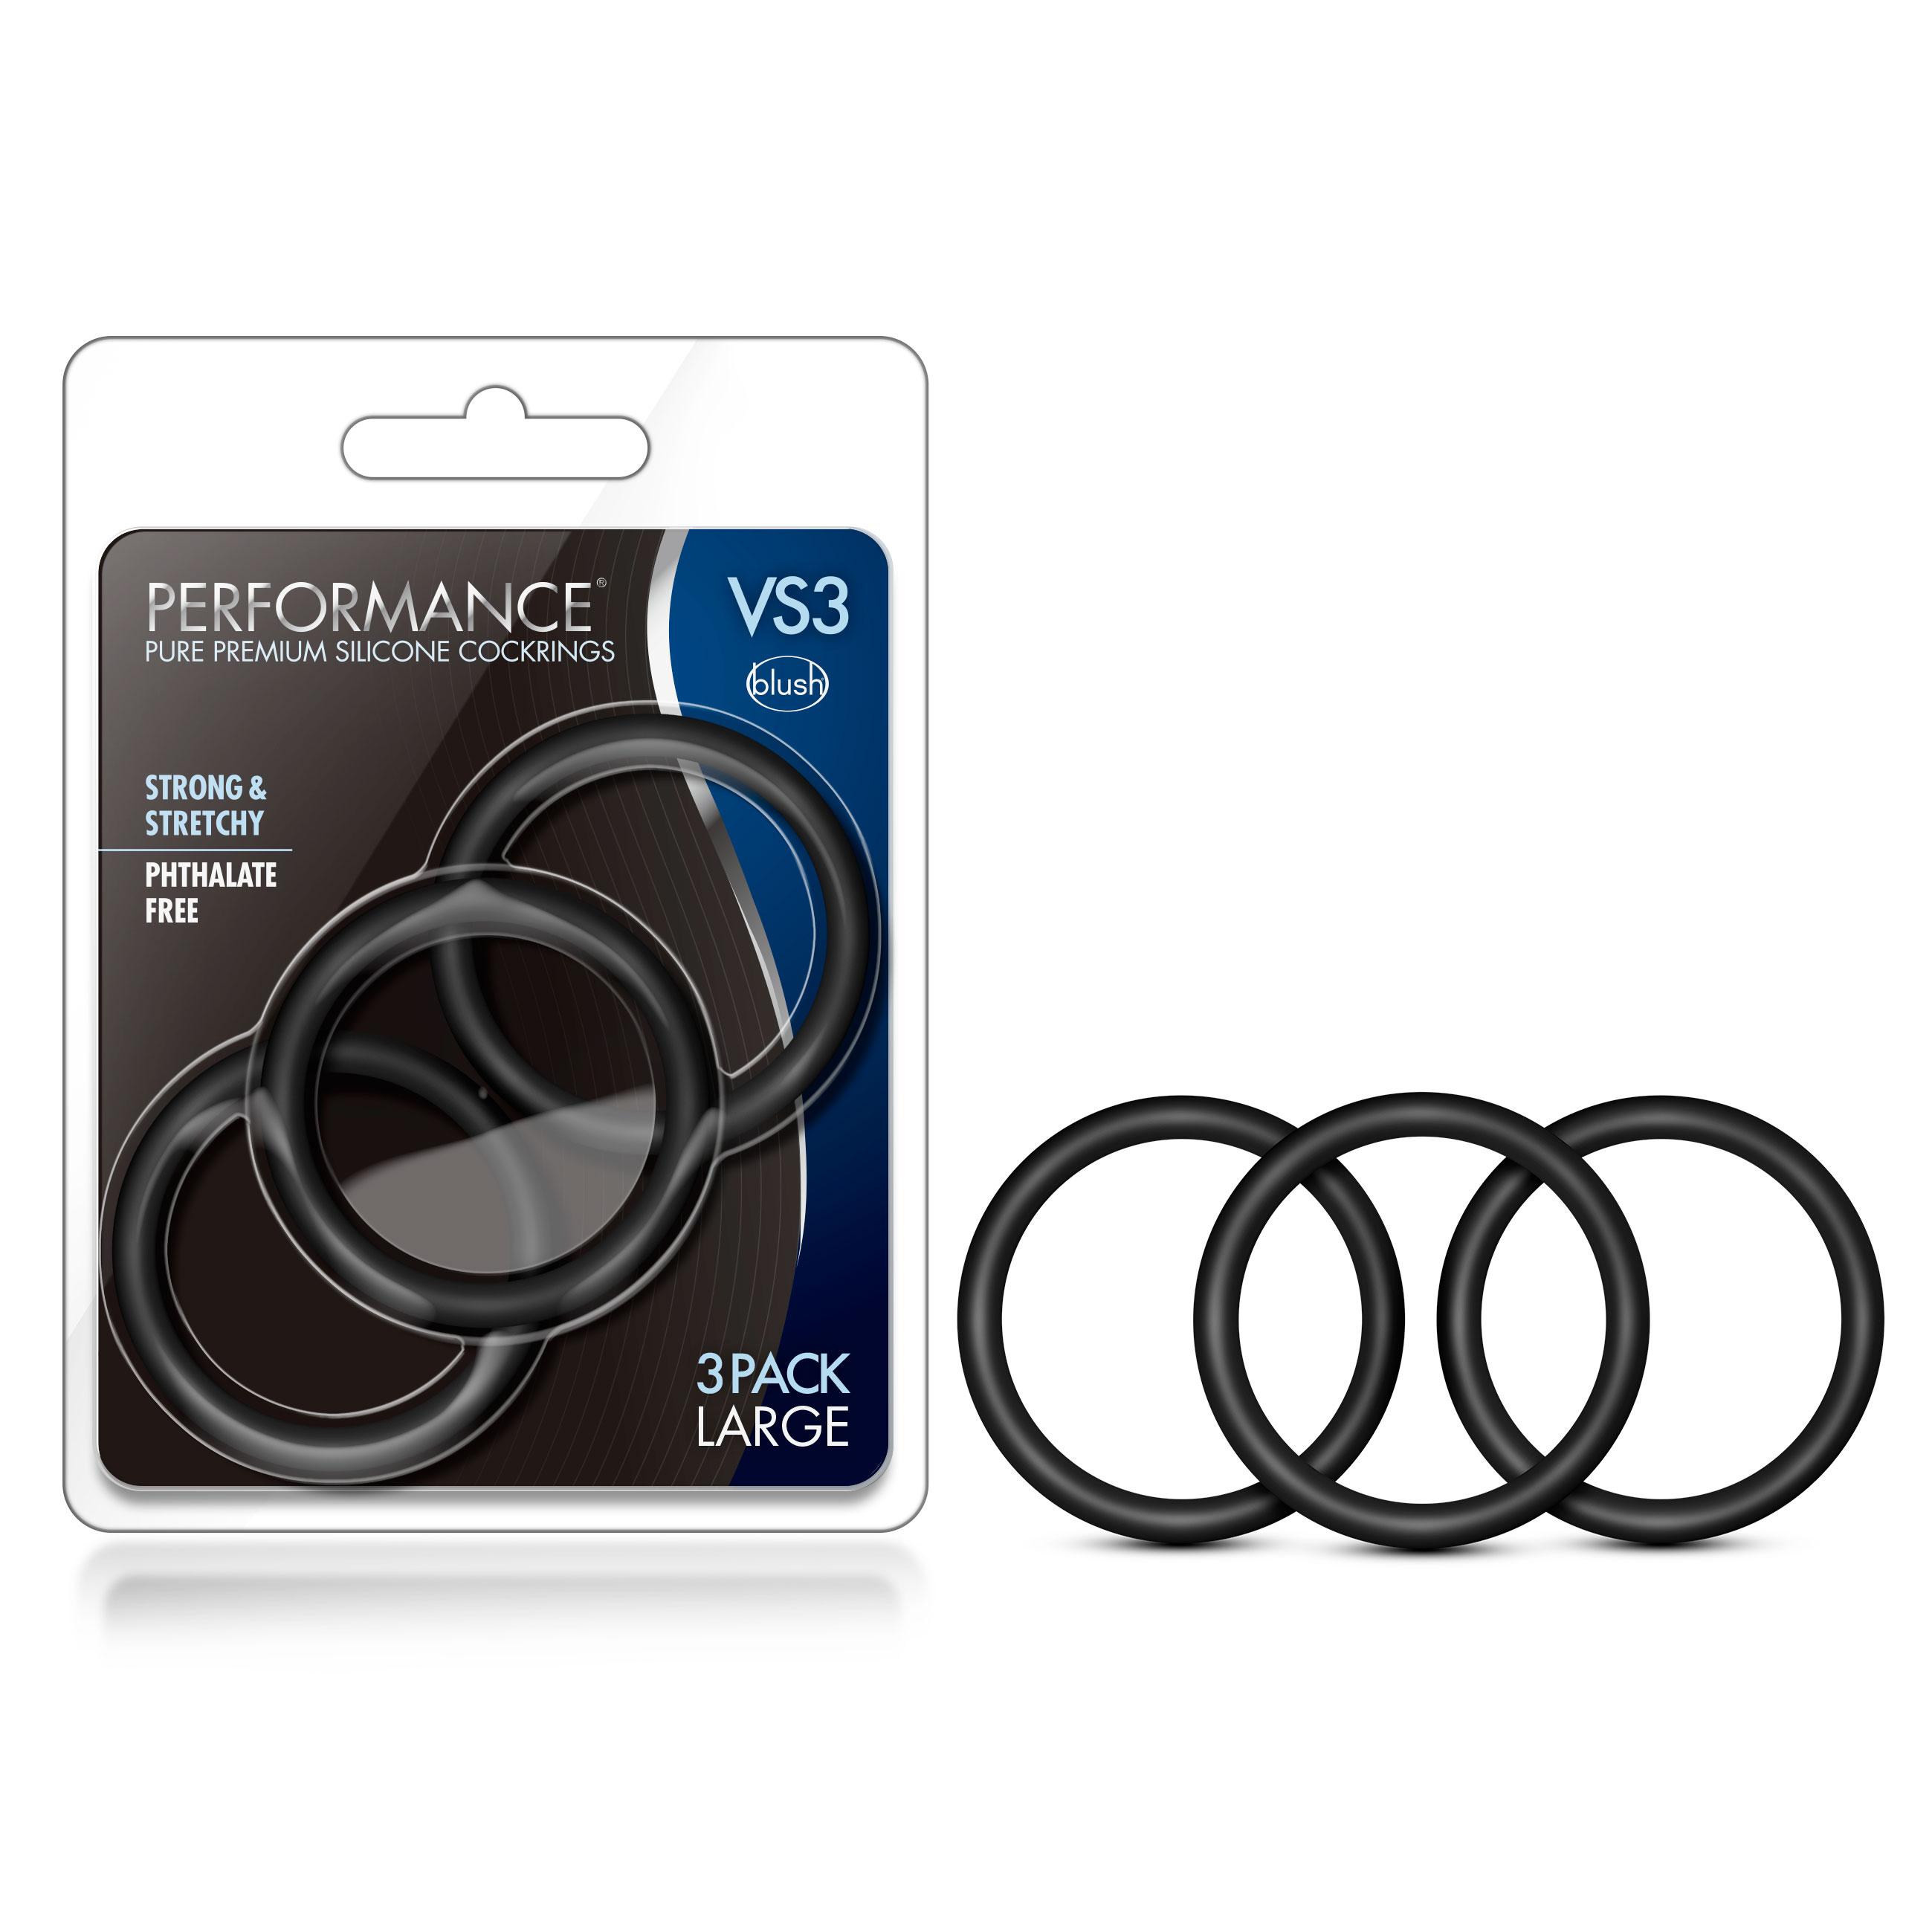 Performance - VS3 Pure Premium Silicone Cock Rings - Large - Black